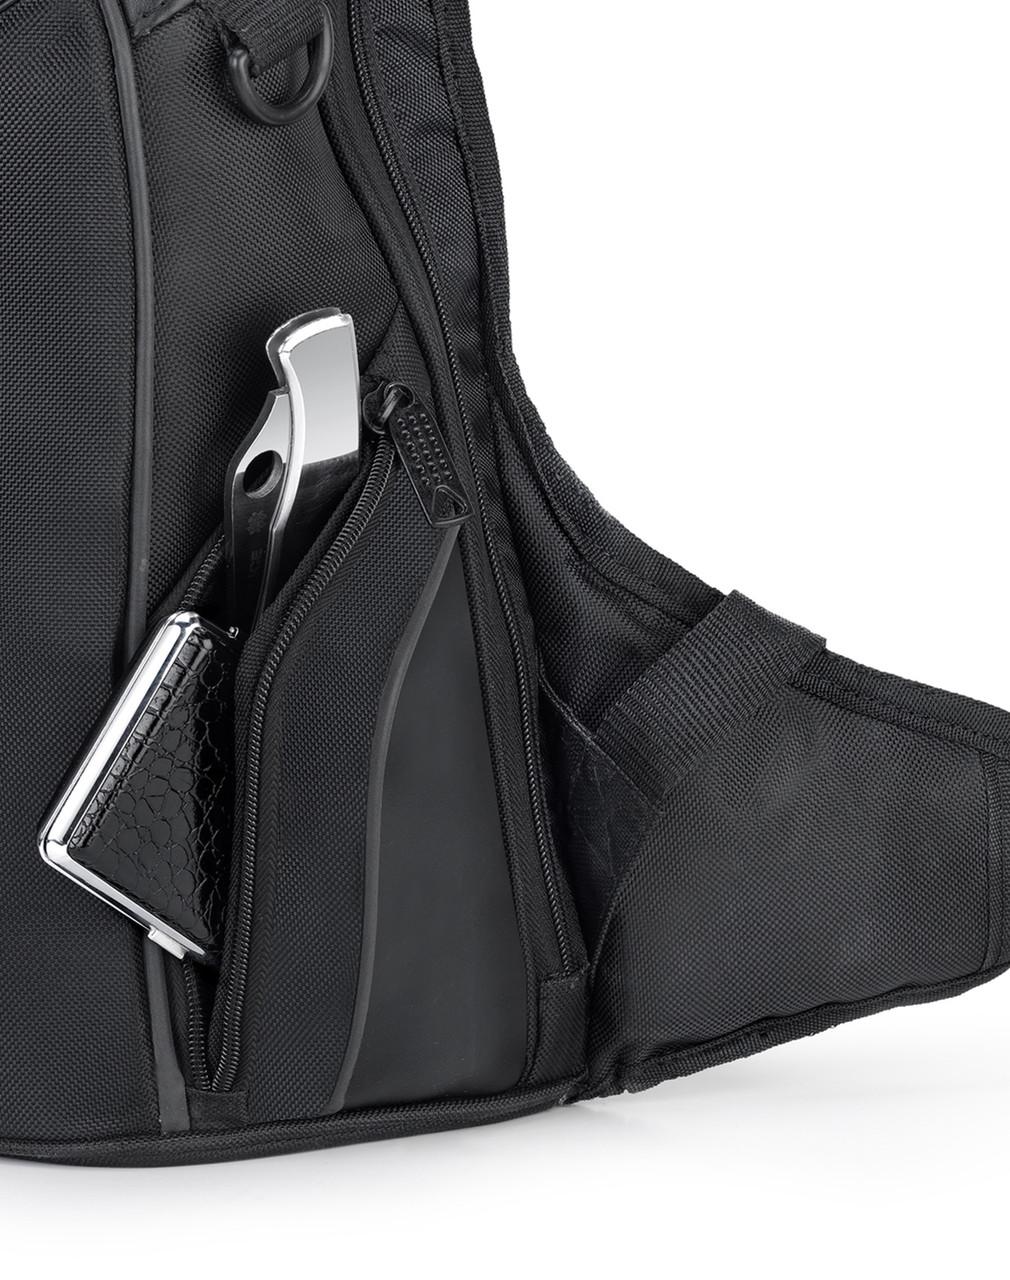 Triumph Viking Motorcycle Medium Backpack Front Pocket